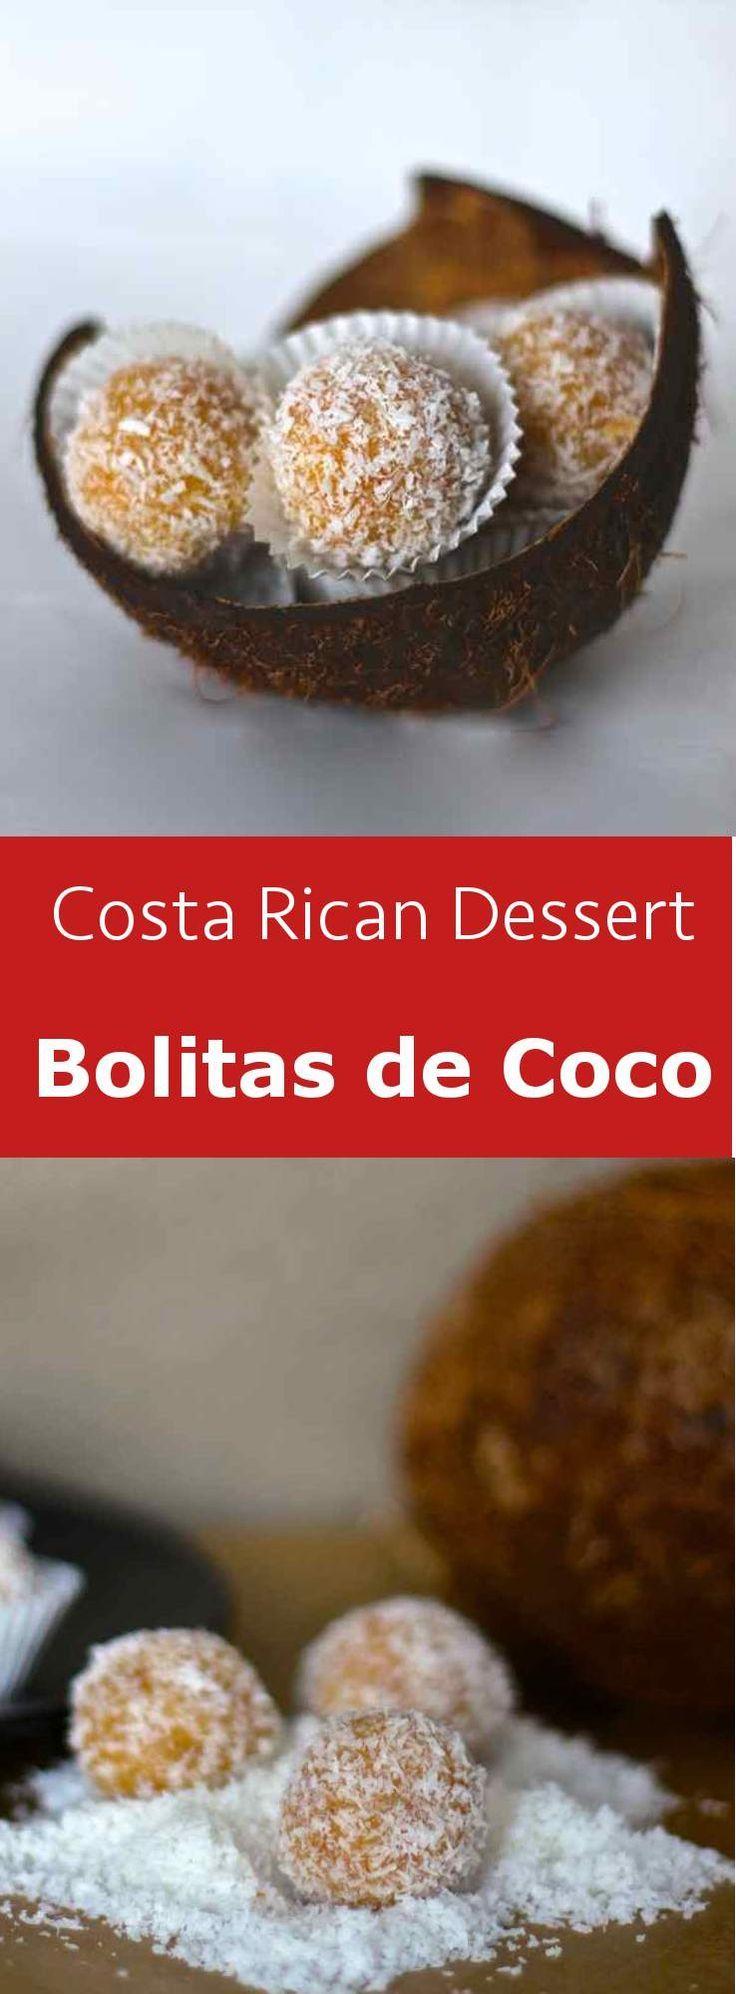 Bolitas de coco are small soft Costa Rican balls made of coconut, condensed milk and galletas Maria (or Graham crackers). #vegetarian #dessert #costarica